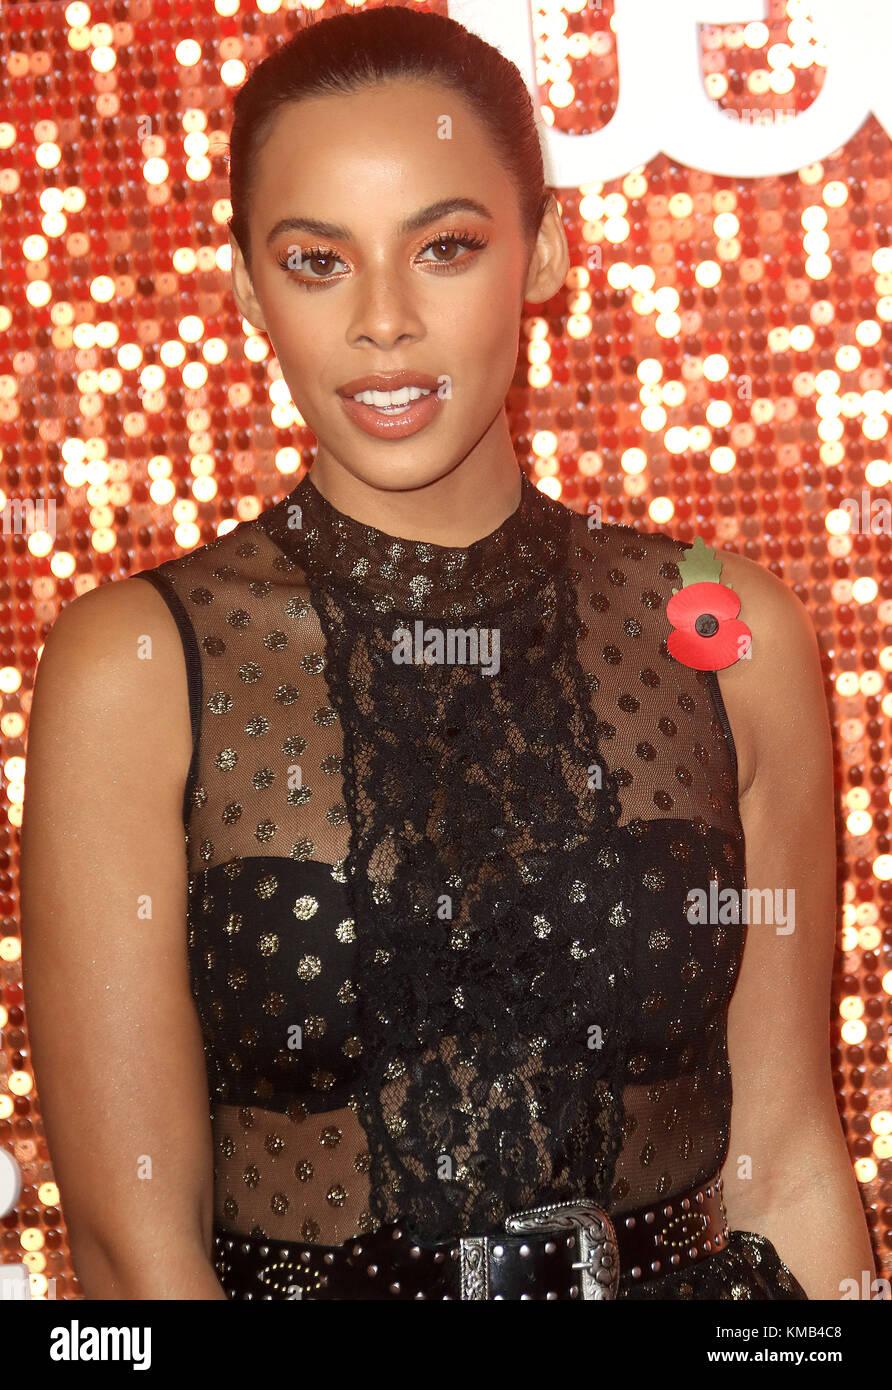 Nov 09, 2017 - Rochelle Humes attending ITV Gala 2017, London Palladium in London, England, UK - Stock Image